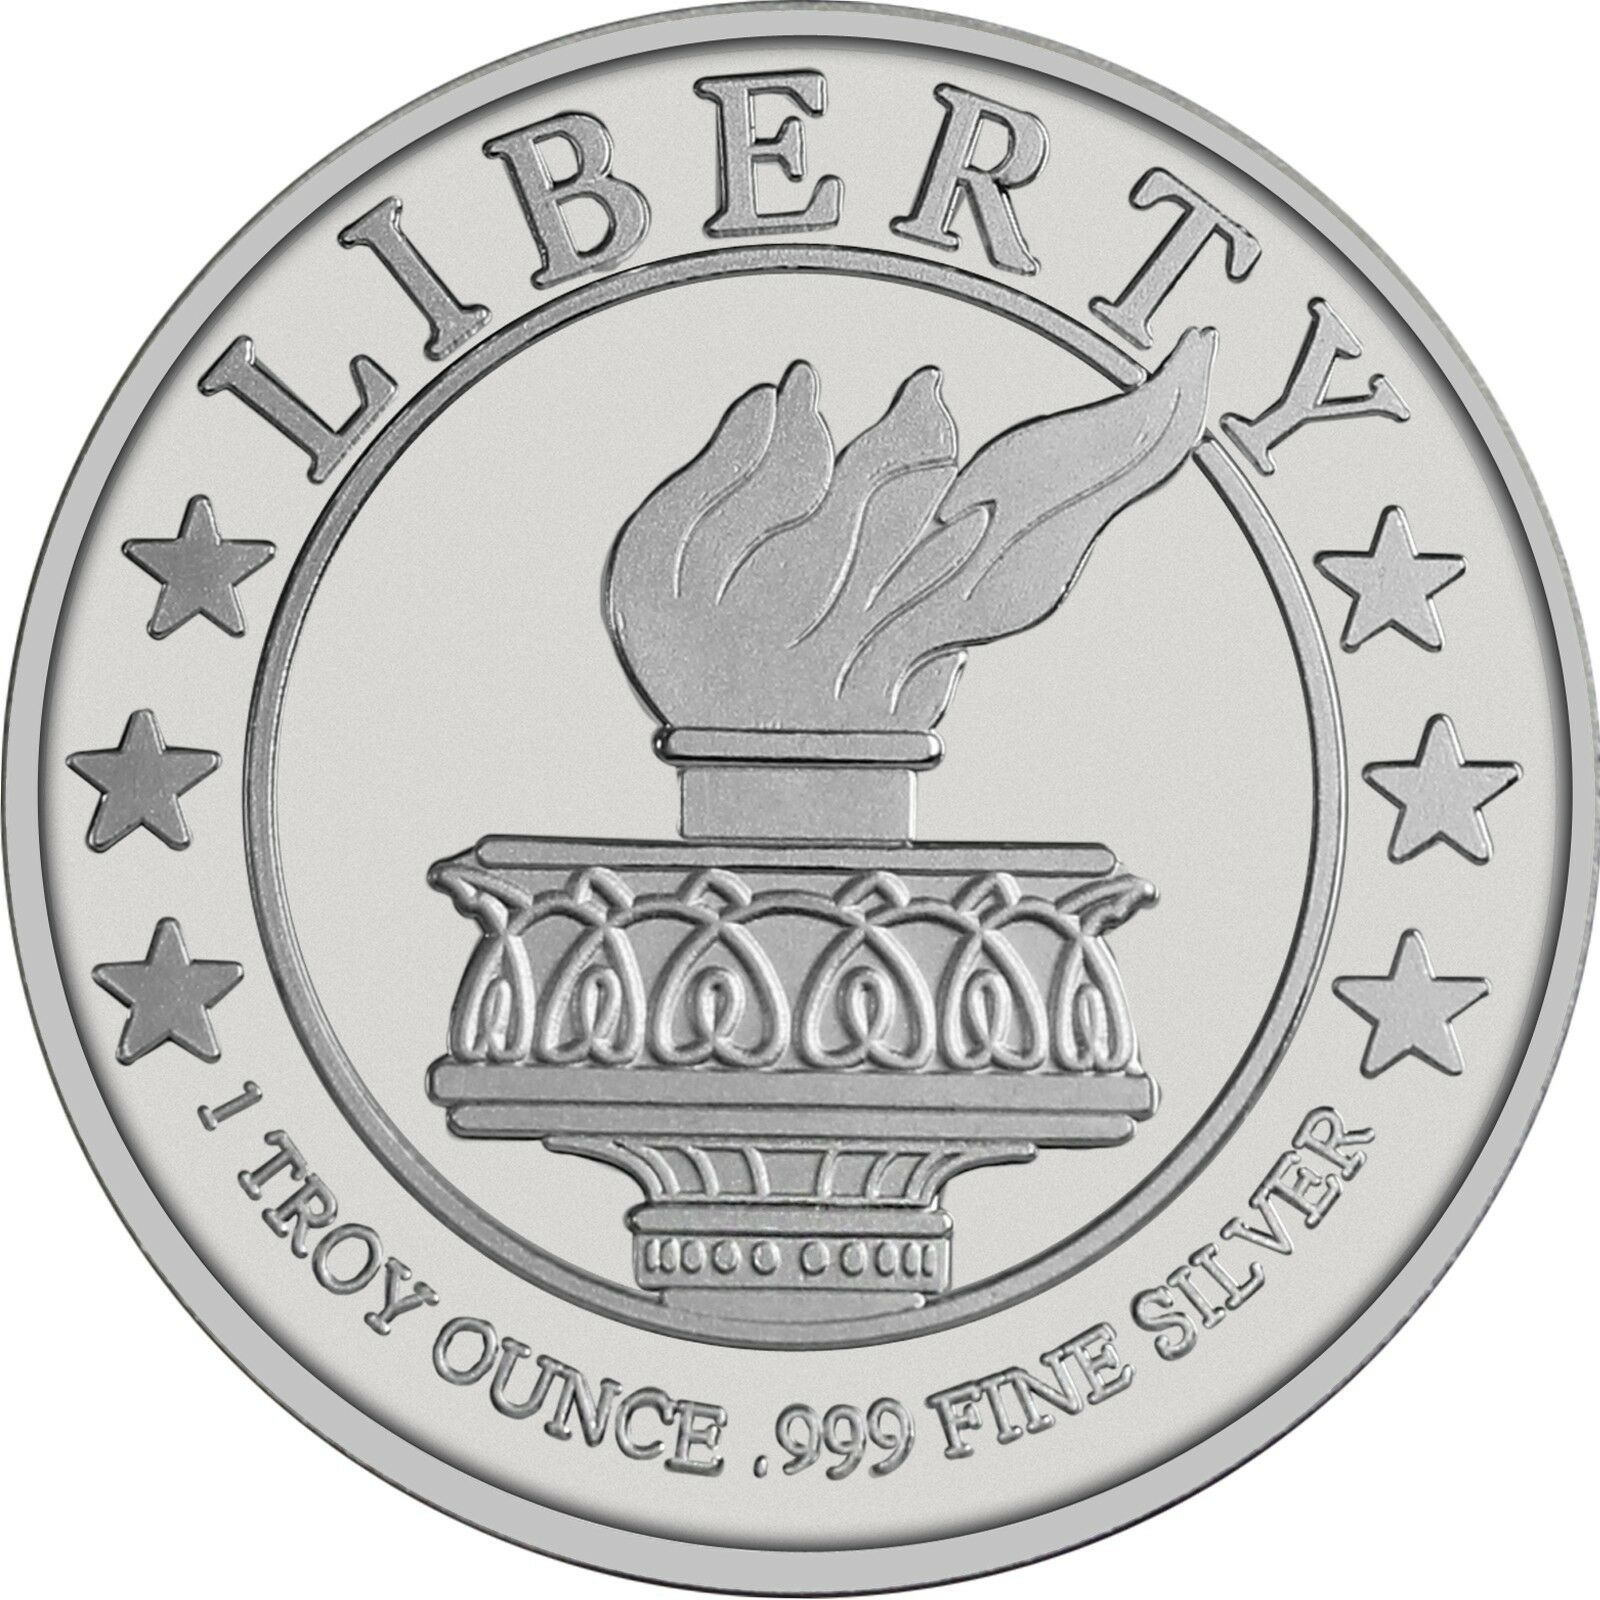 Купить Lady Liberty 1 oz .999 Fine Silver Round - LOT of 20